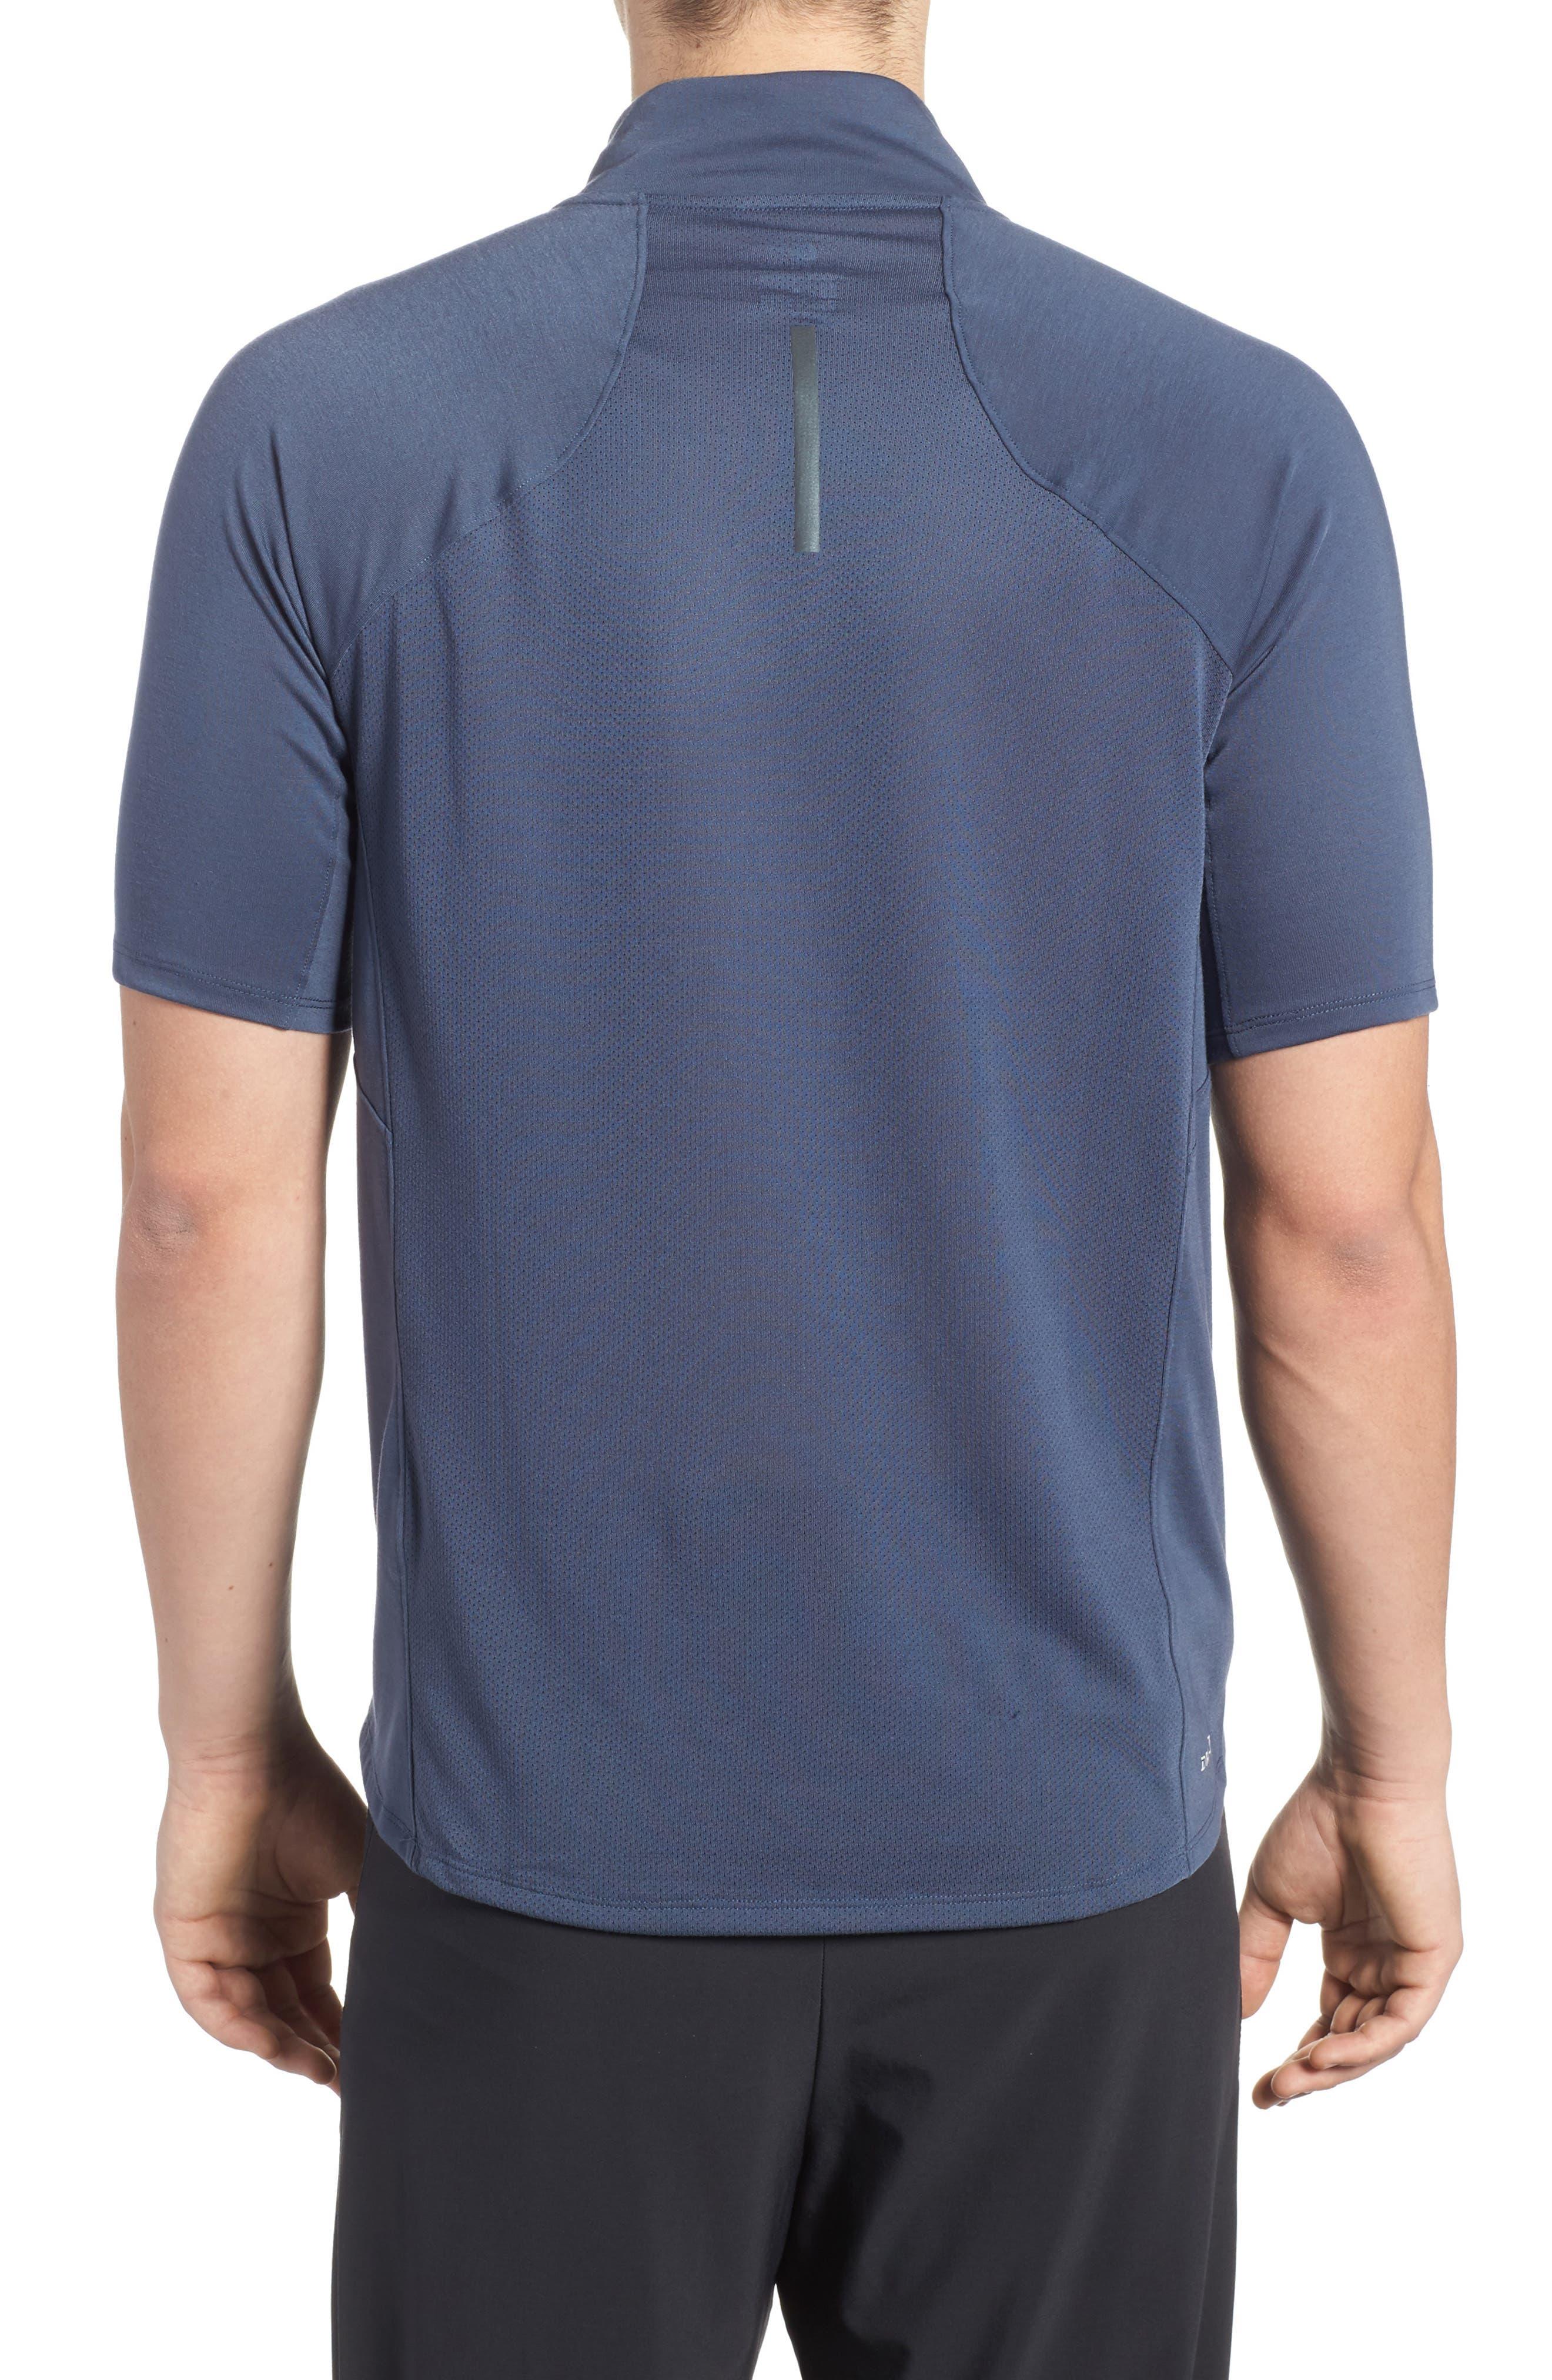 Tailwind Running T-Shirt,                             Alternate thumbnail 2, color,                             Thunder Blue